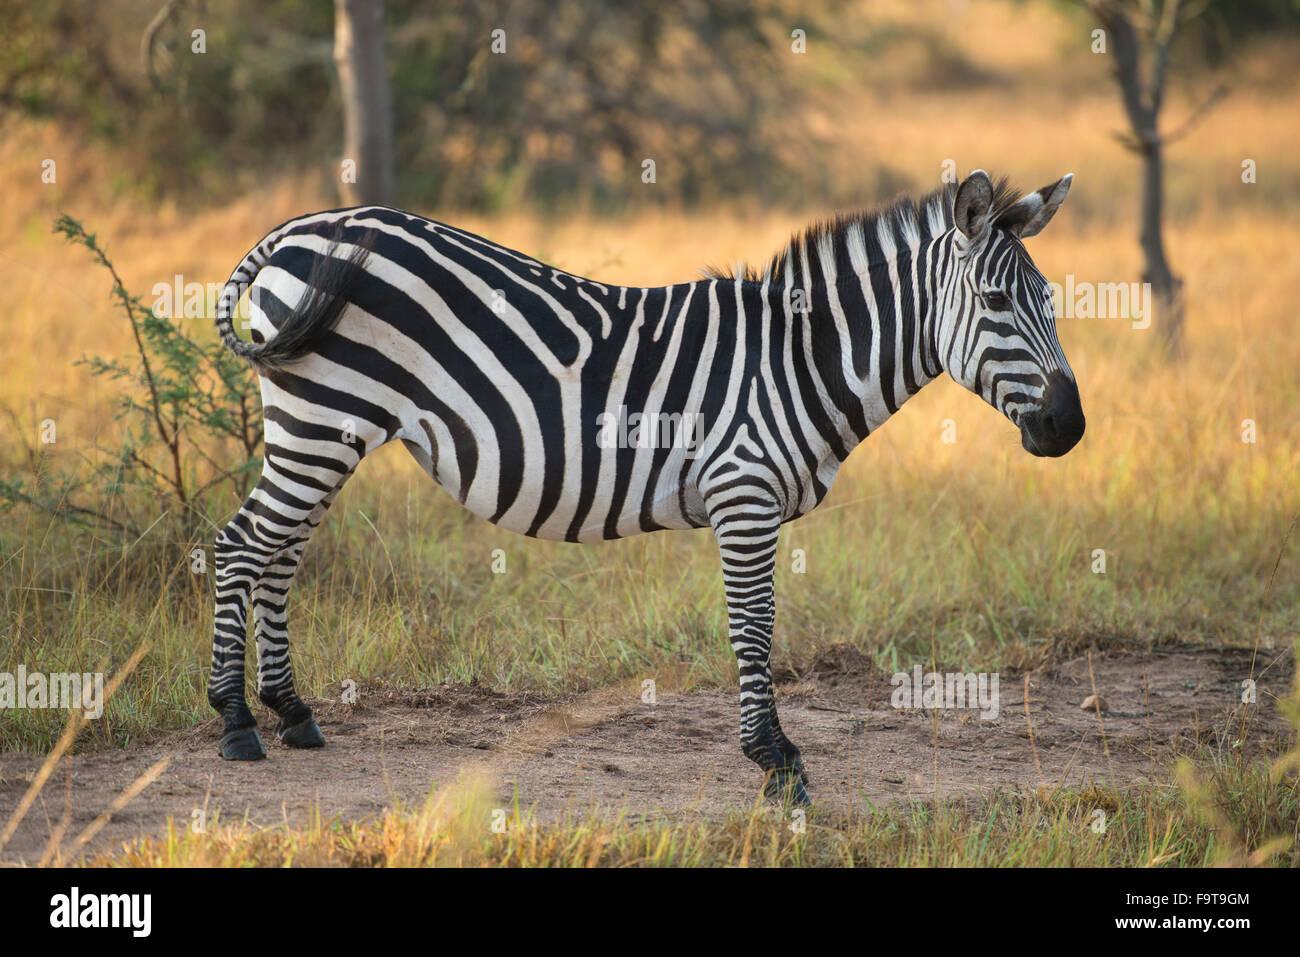 La Burchell zebra (Equus burchellii), il lago Mburo National Park, Uganda Immagini Stock